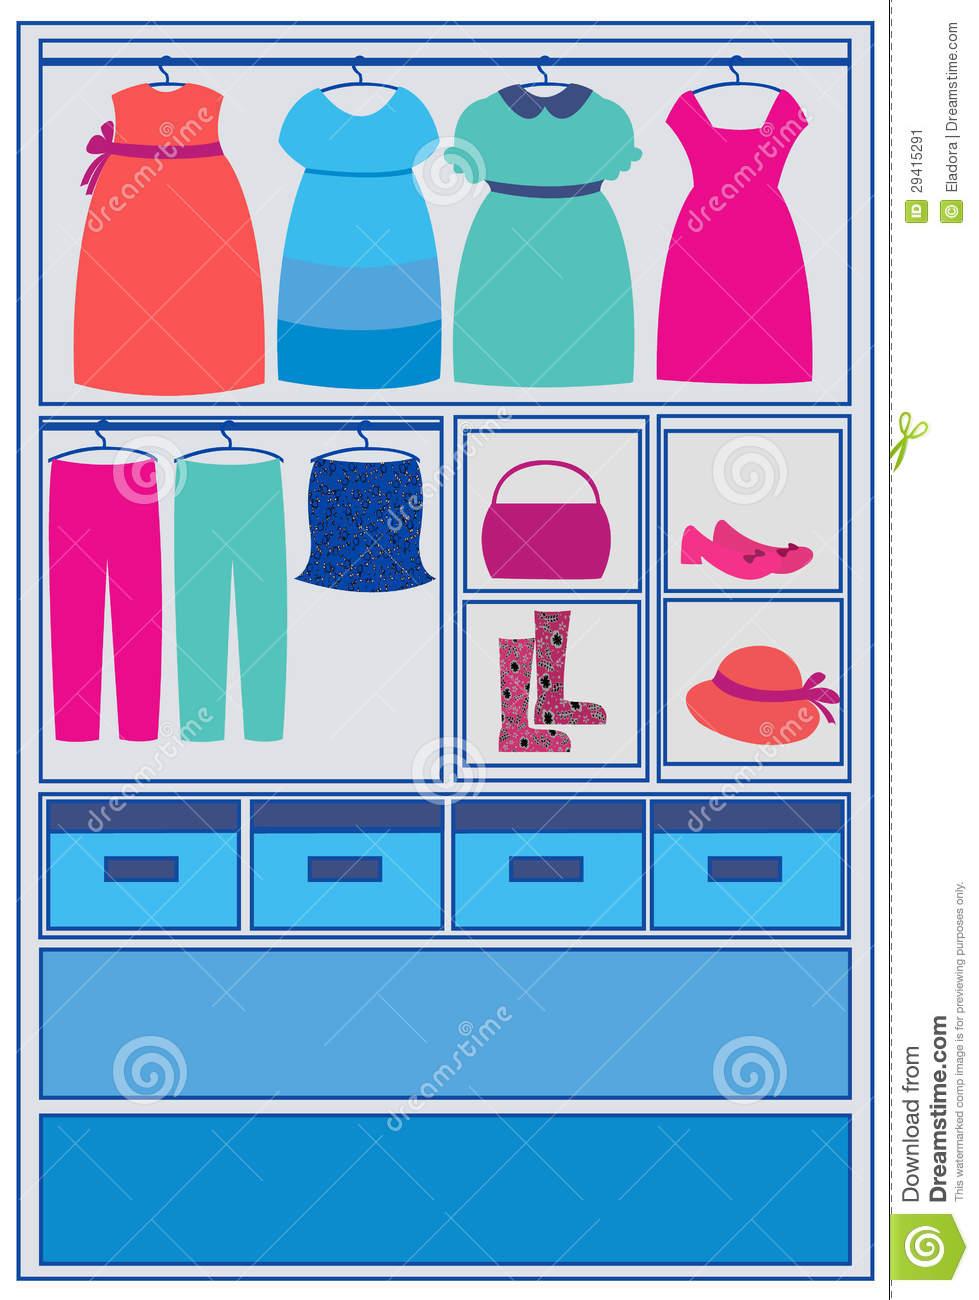 Fashion . Closet clipart